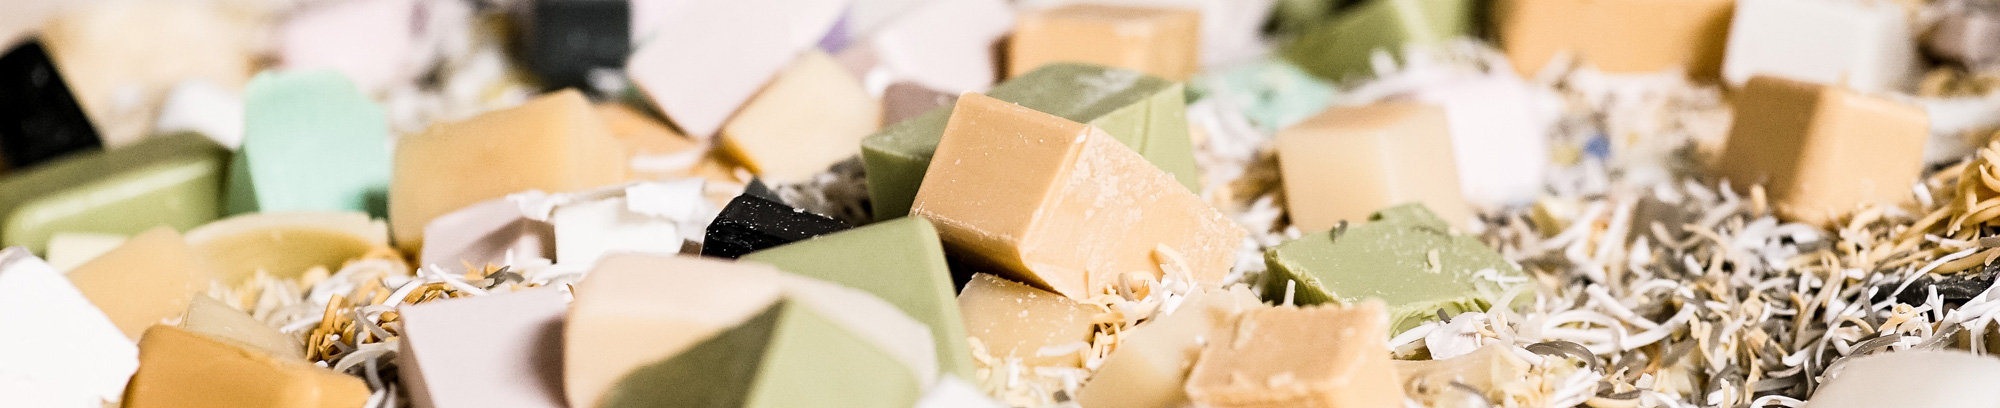 bar soap waste rework